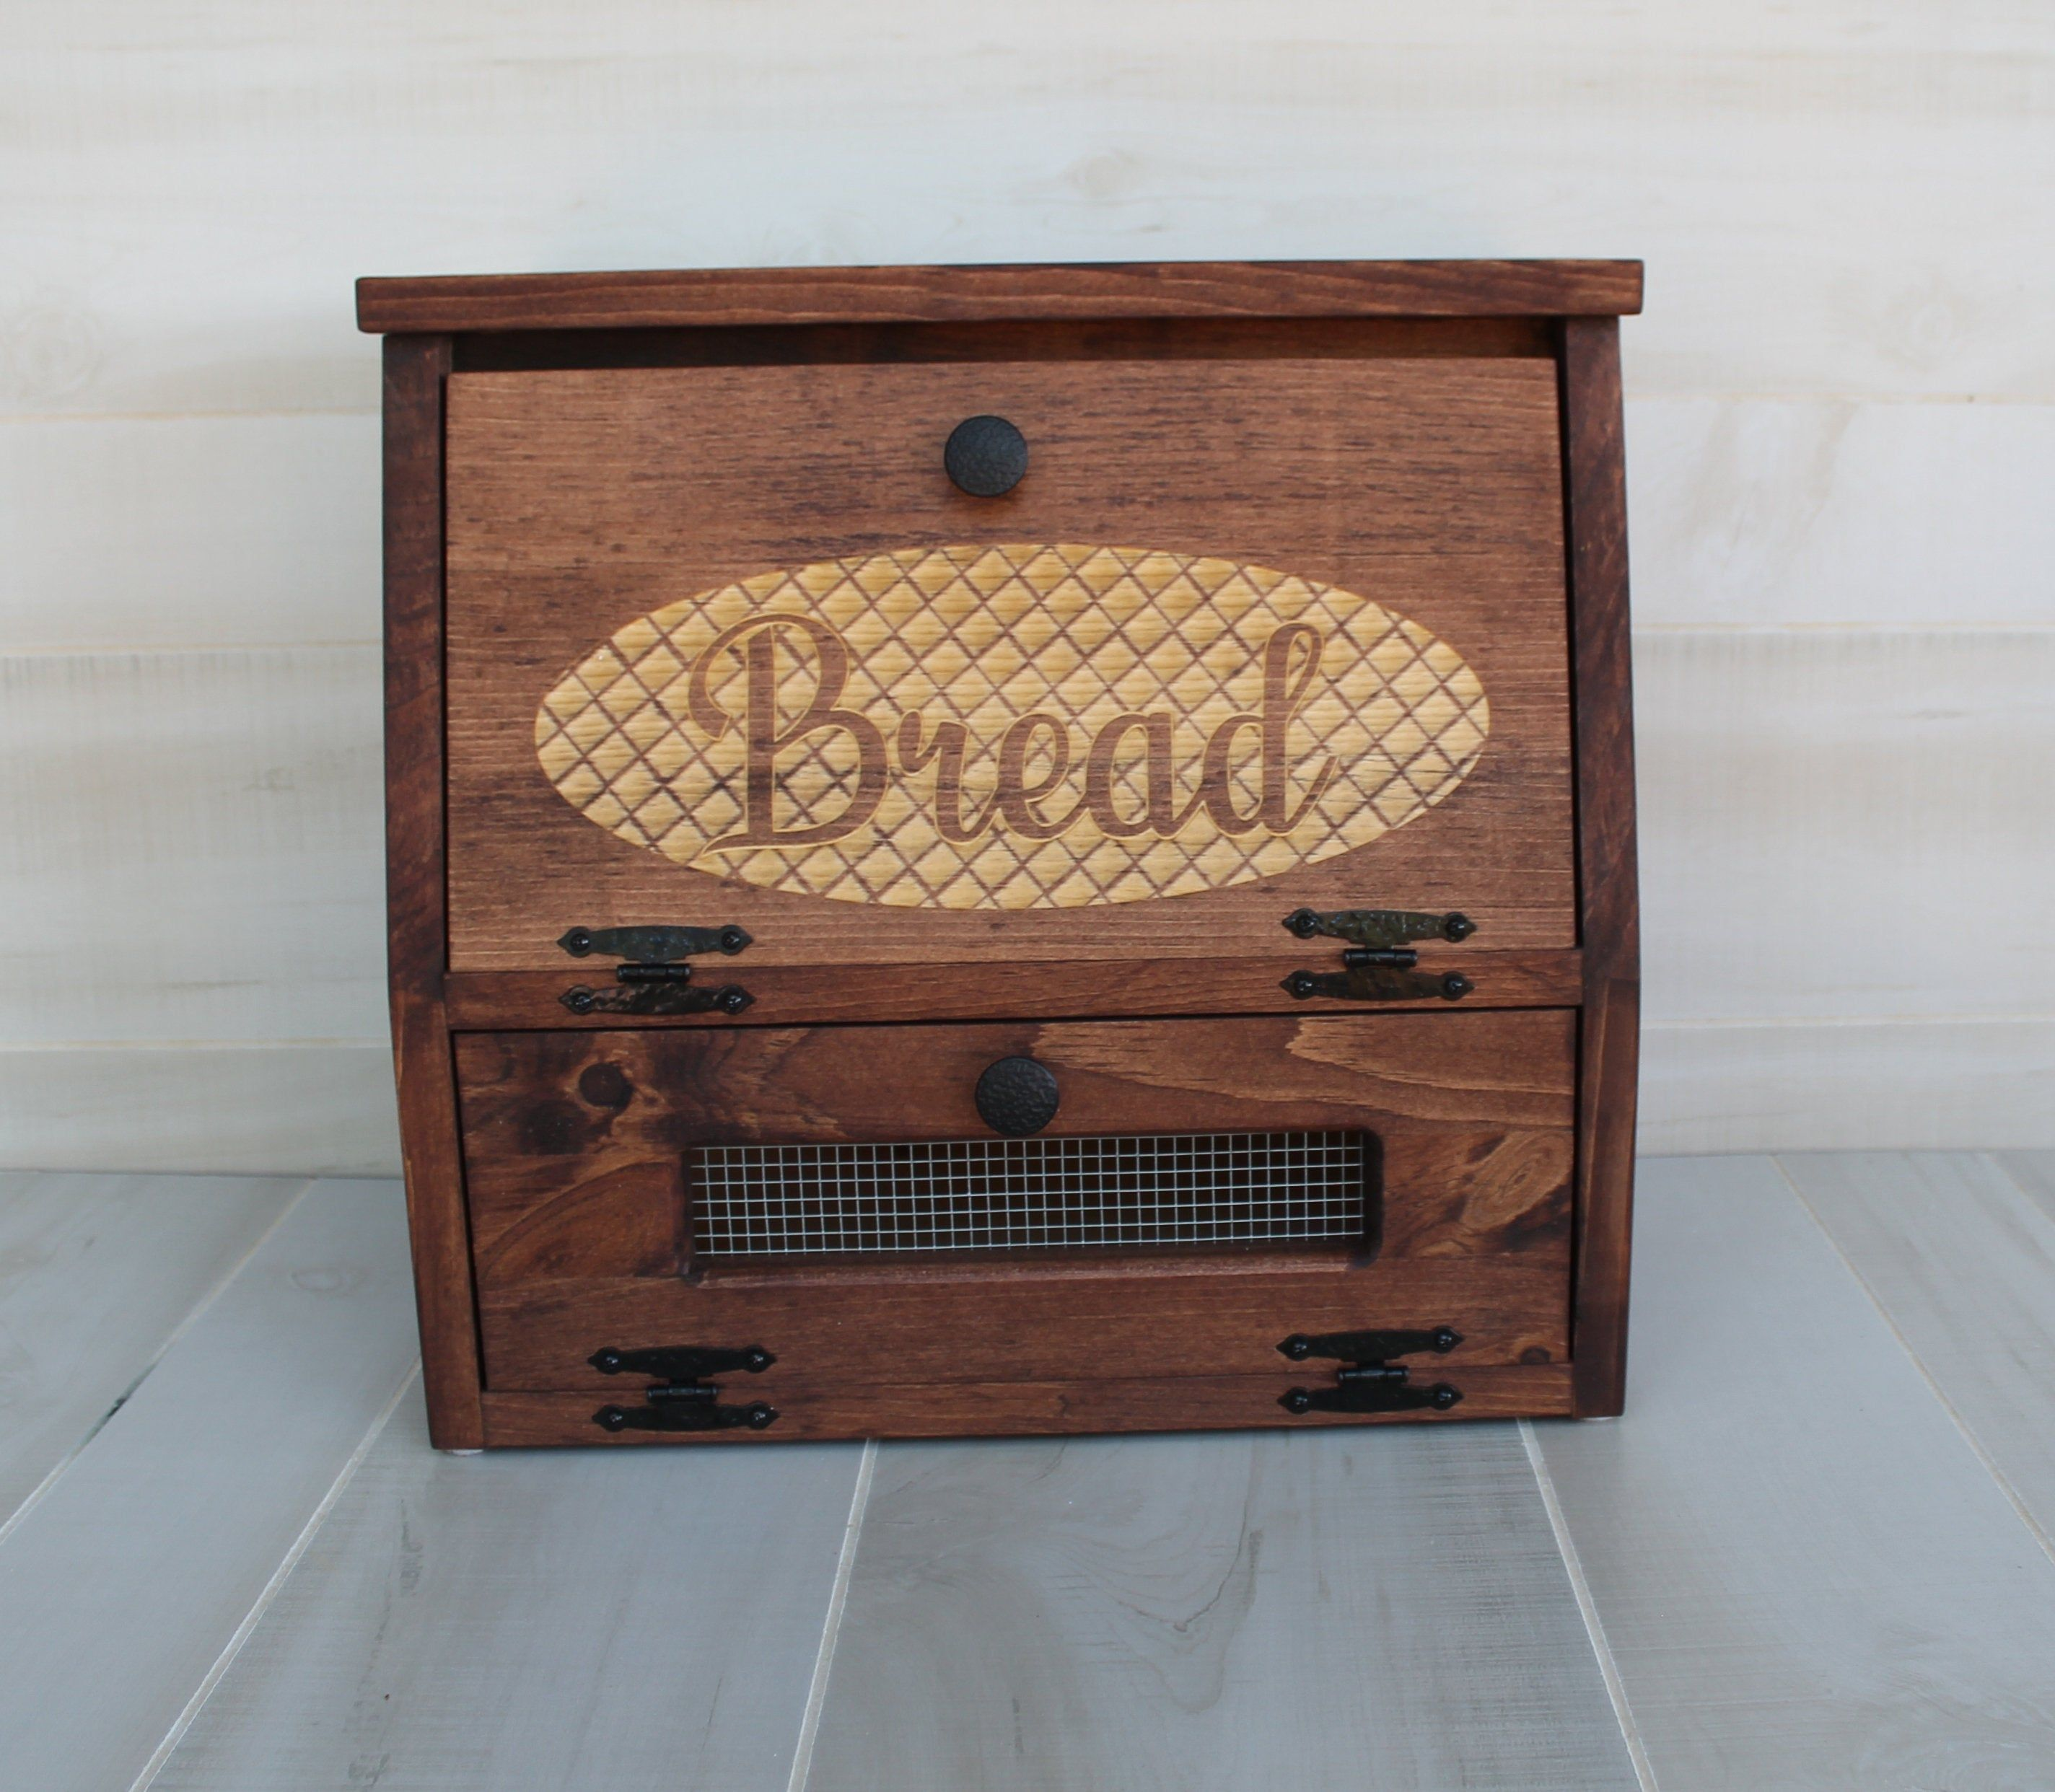 Farmhouse Bread Box Vegetable Bin Rustic Wooden Engraved Storage